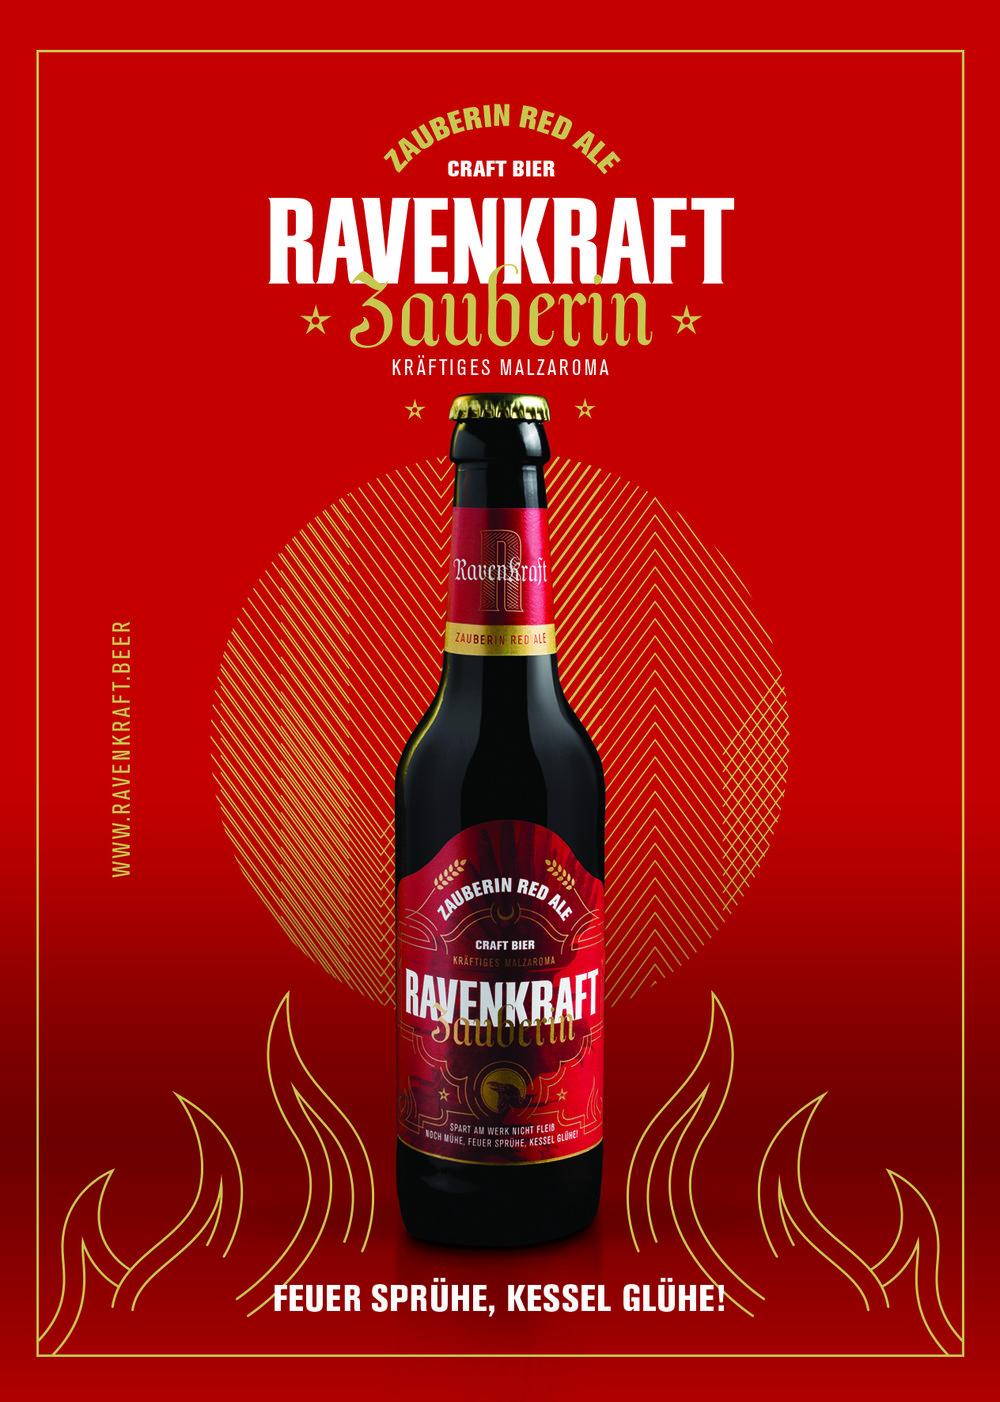 RavenKraft_flyer_2c-2.jpg